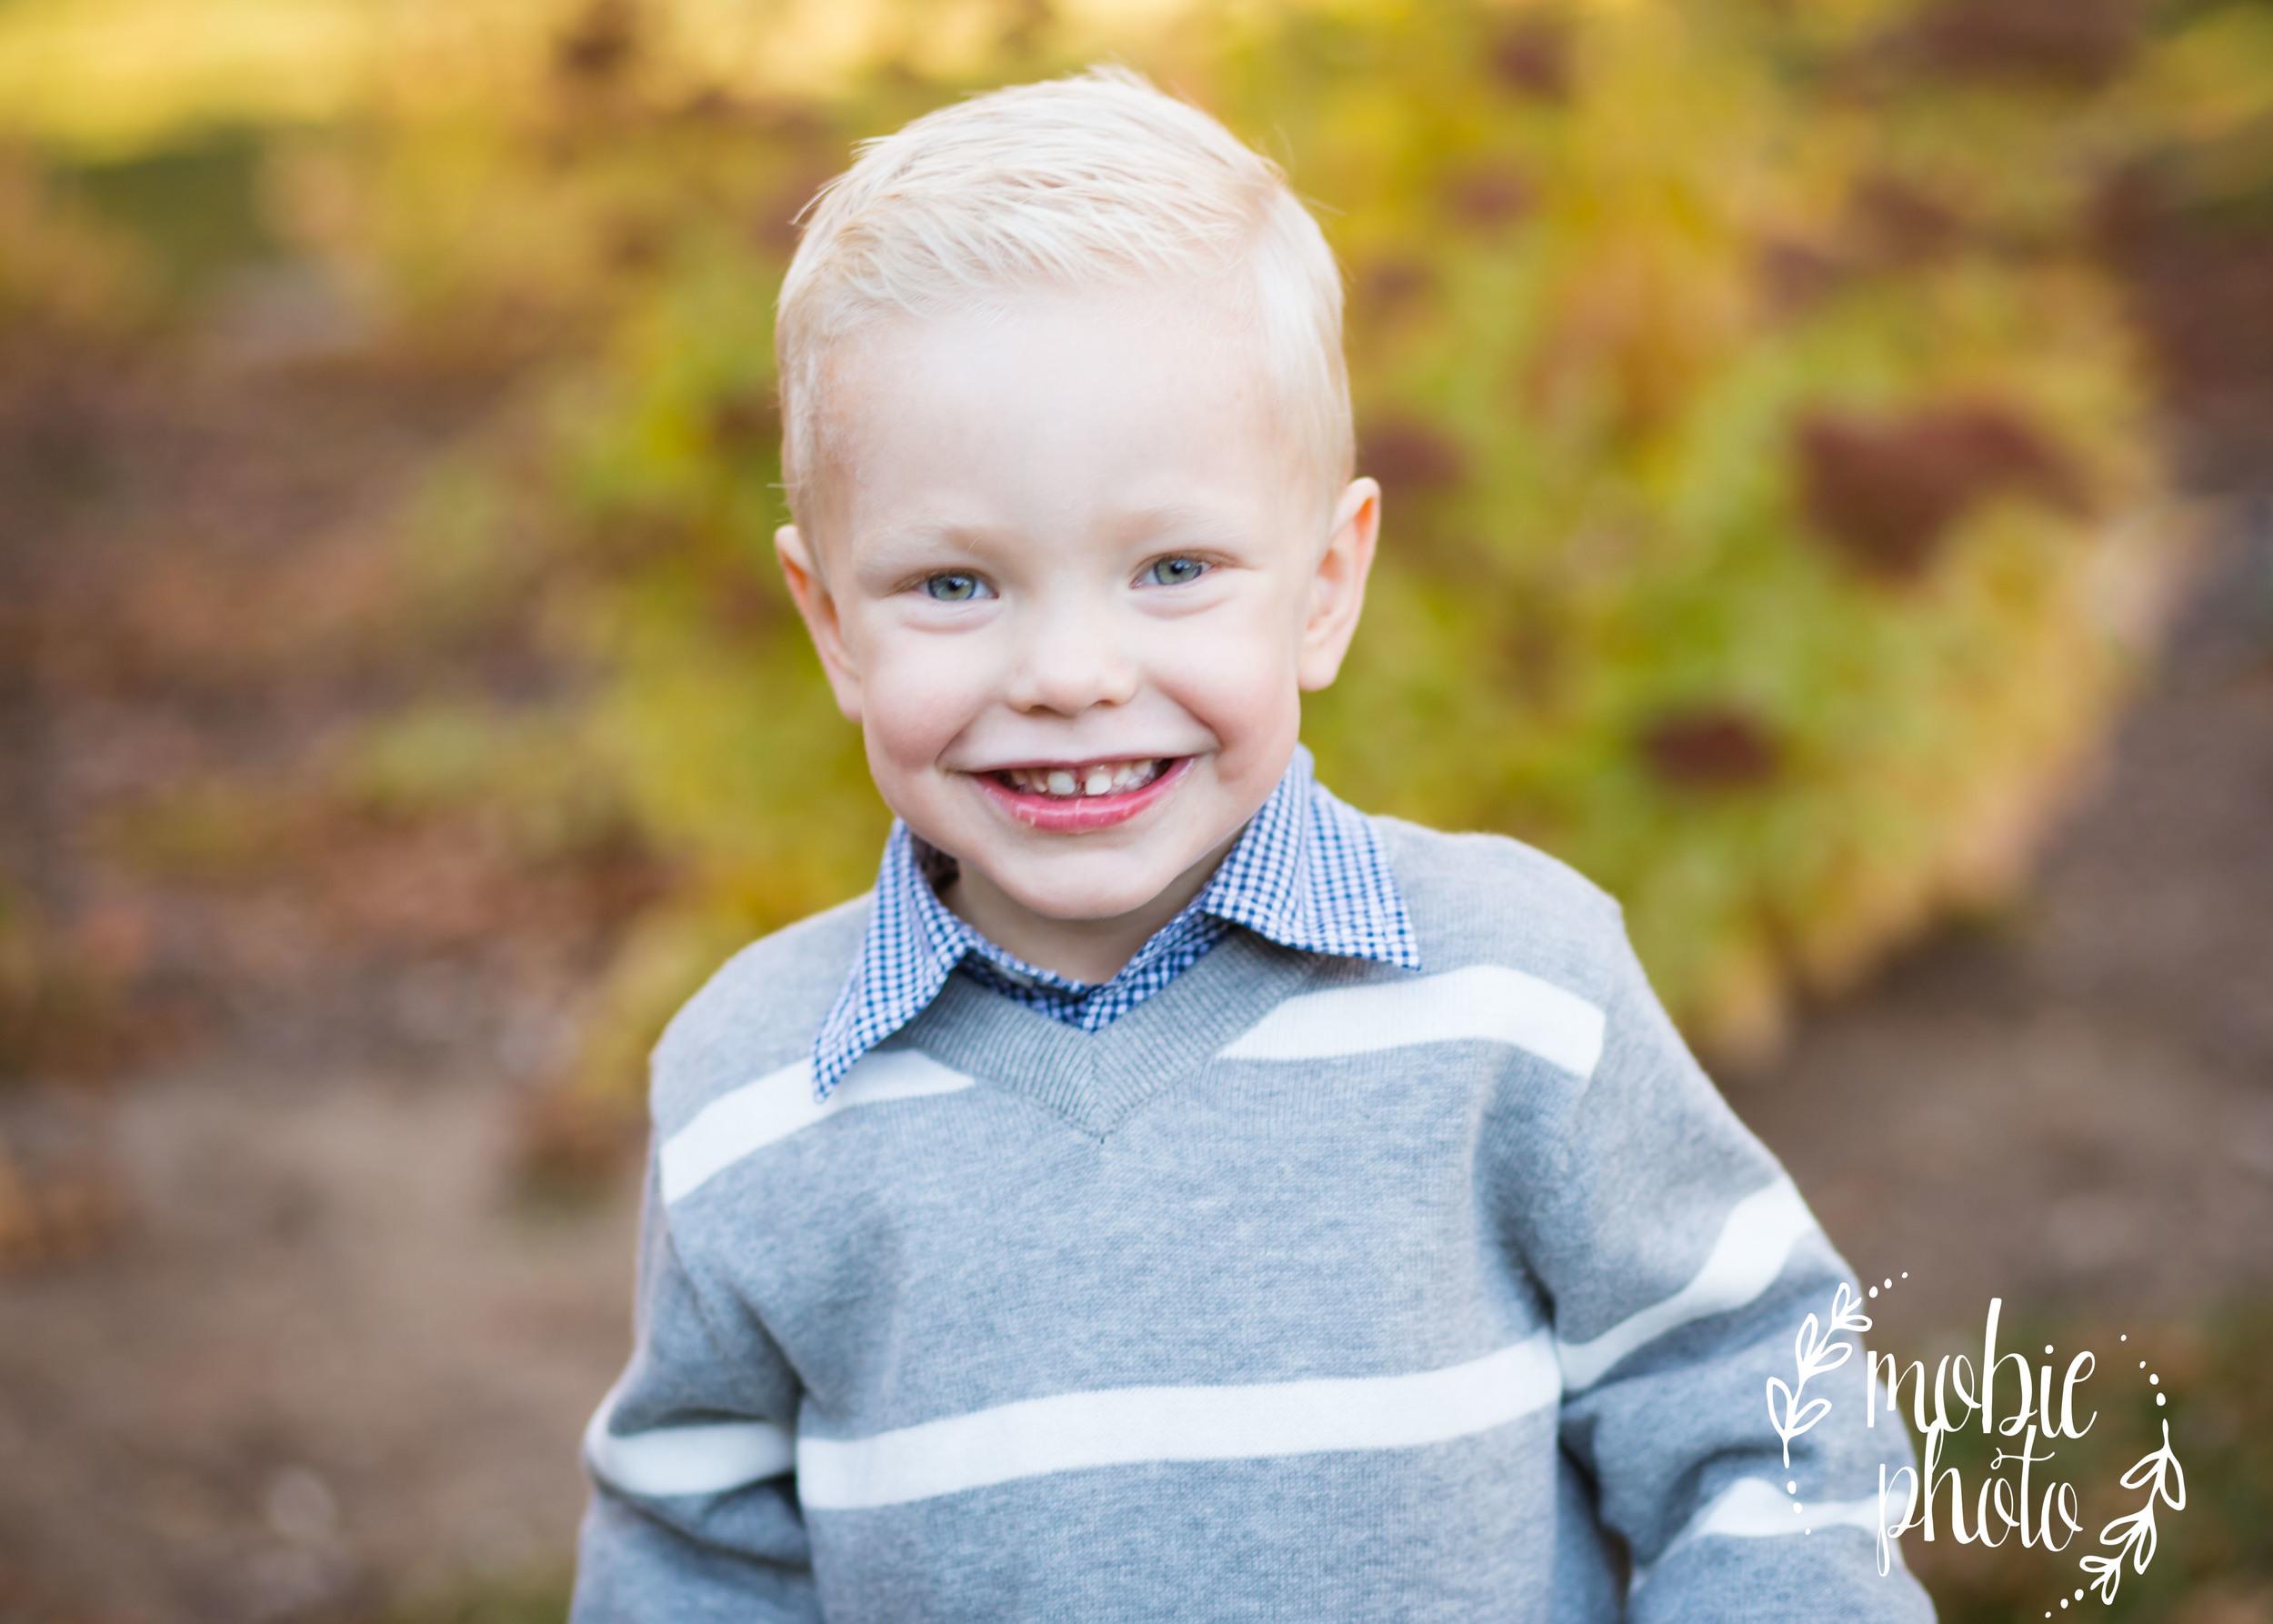 Mobie Photo - Family Photographer in Lehi, Utah